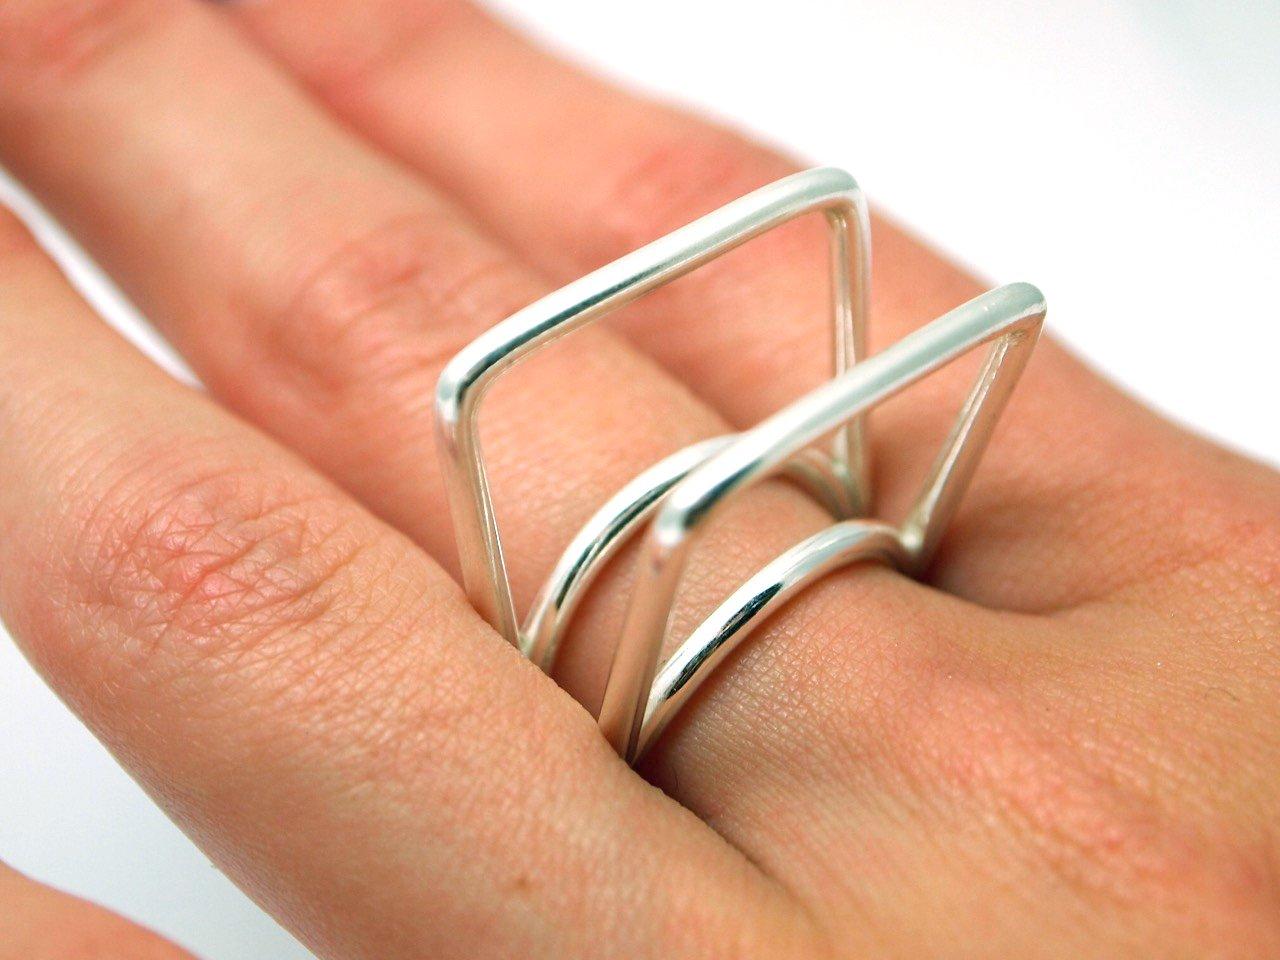 Learning jewellery making fundamentals